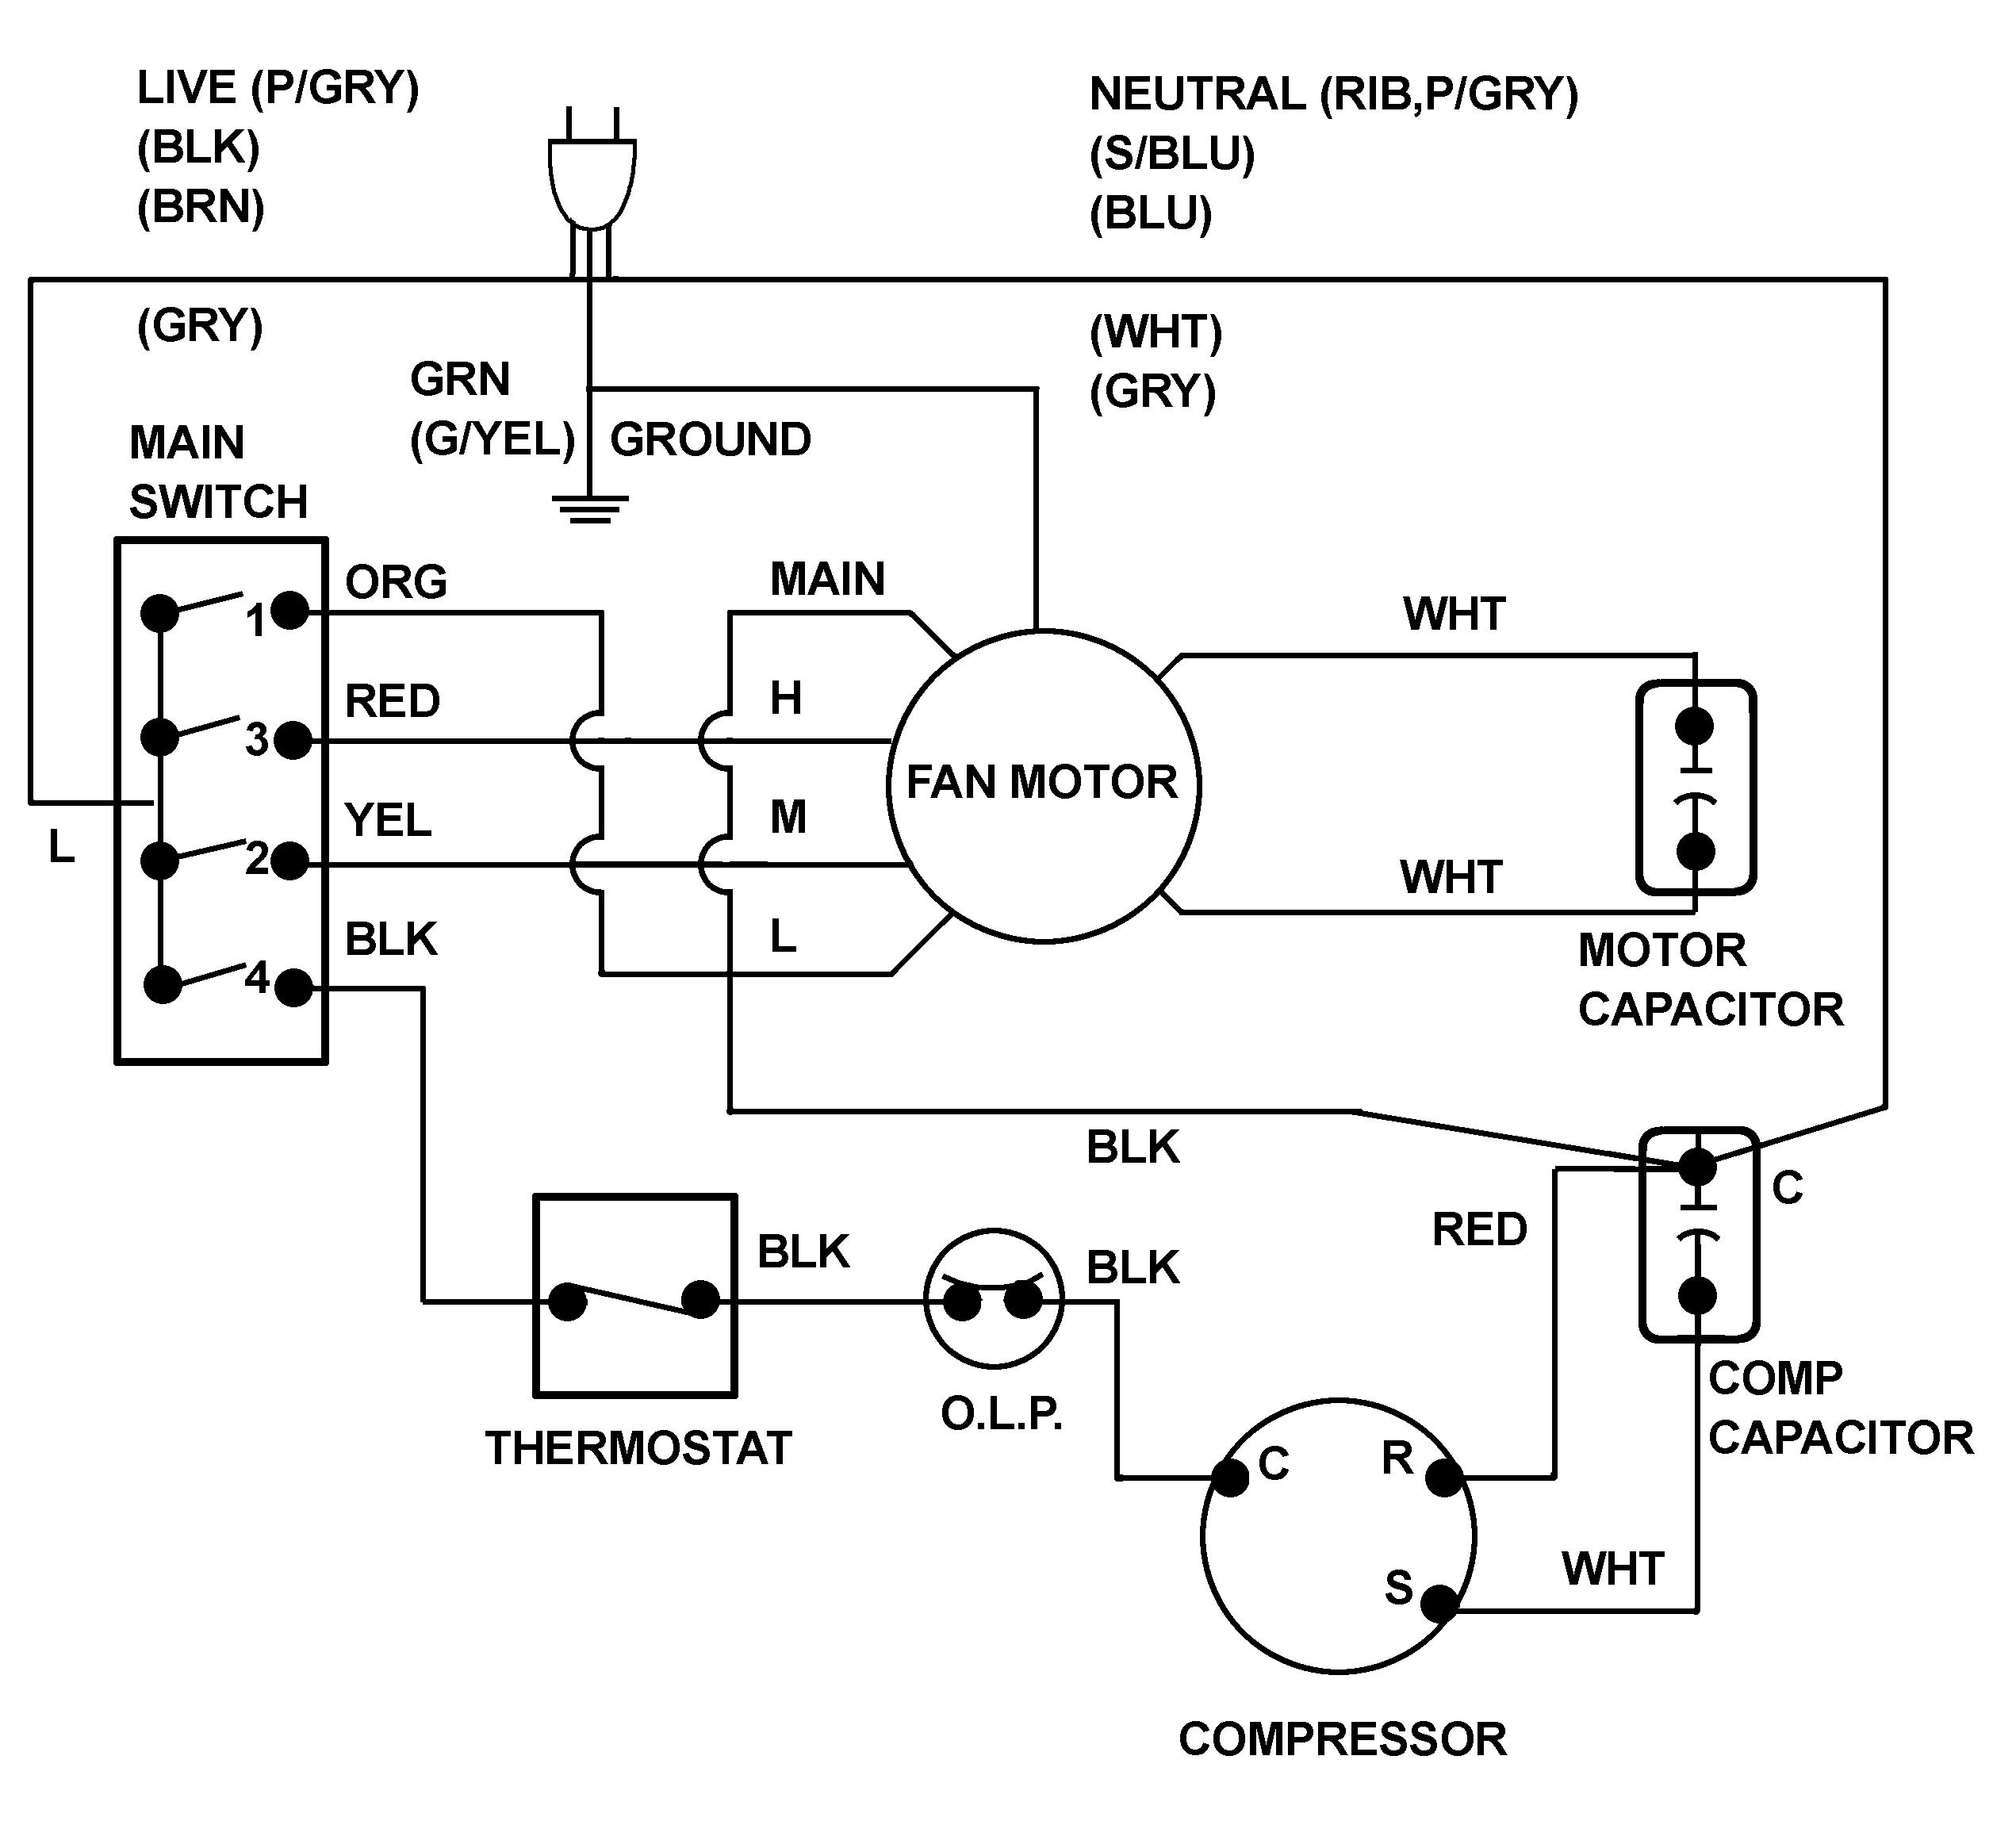 Ac Hvac Wiring | Wiring Diagram - Central Air Conditioner Wiring Diagram